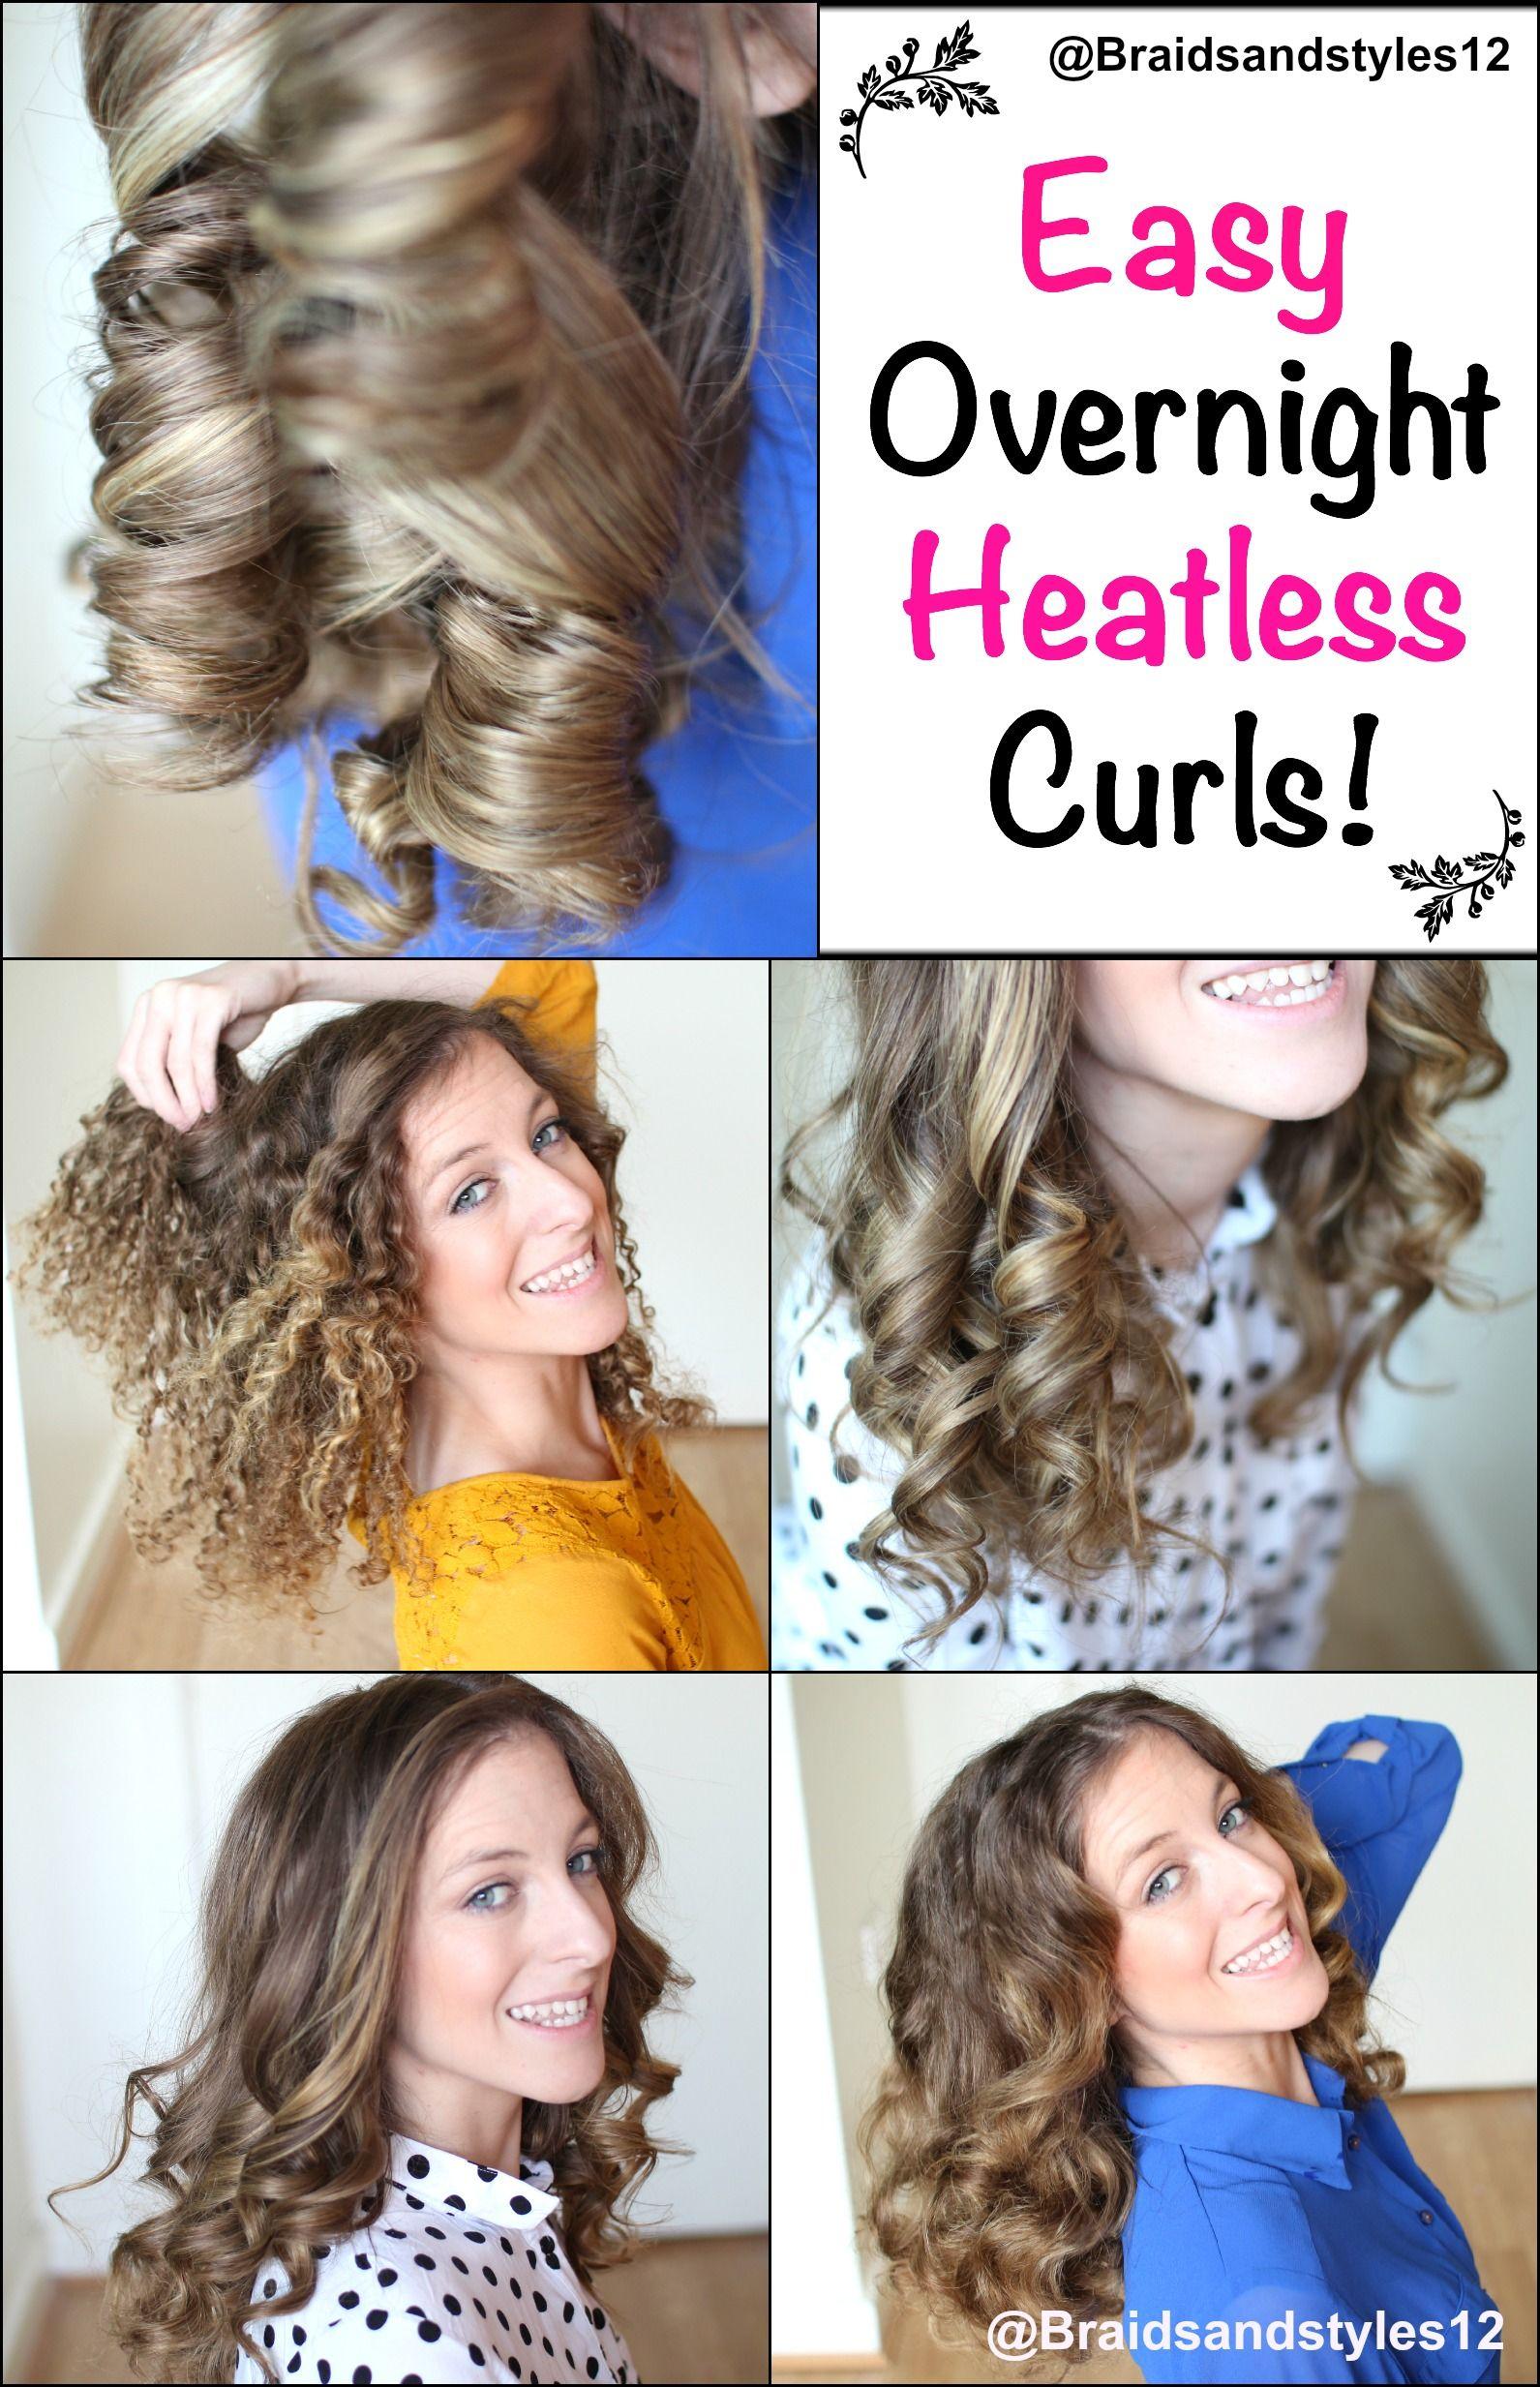 Braidsandstyles12 Hairs Heatless Curls Curl Hair Overnight Hair Without Heat